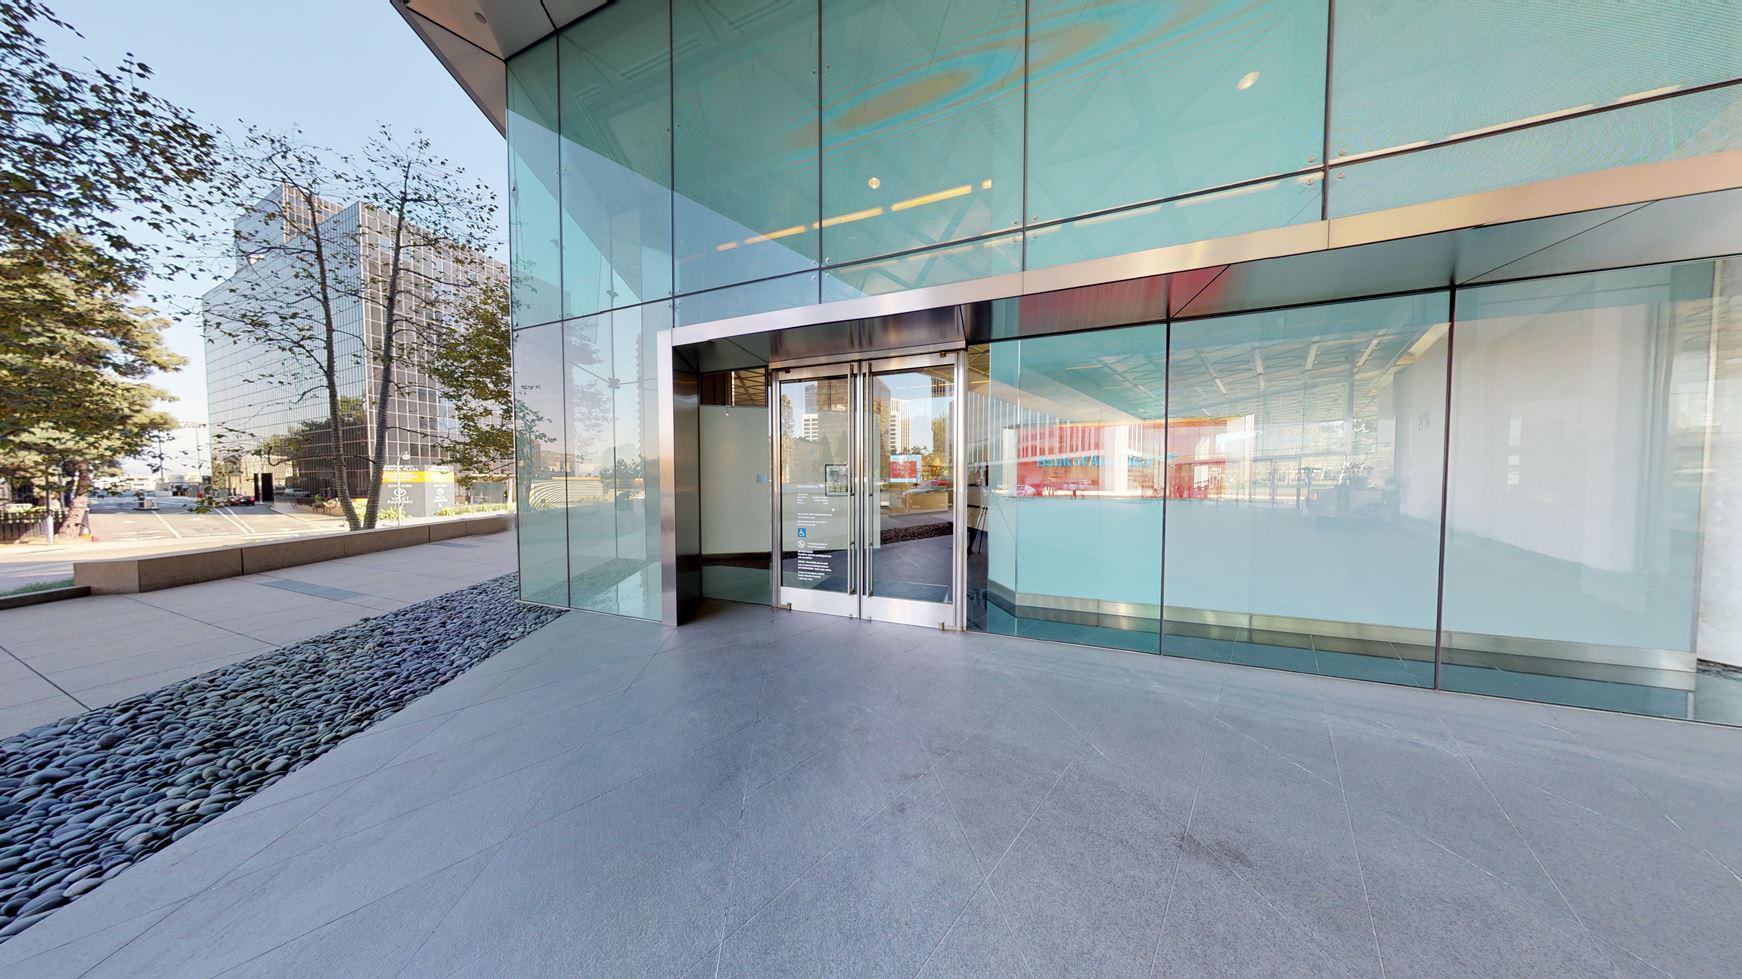 Bank of America financial center with walk-up ATM   2049 Century Park E, Los Angeles, CA 90067